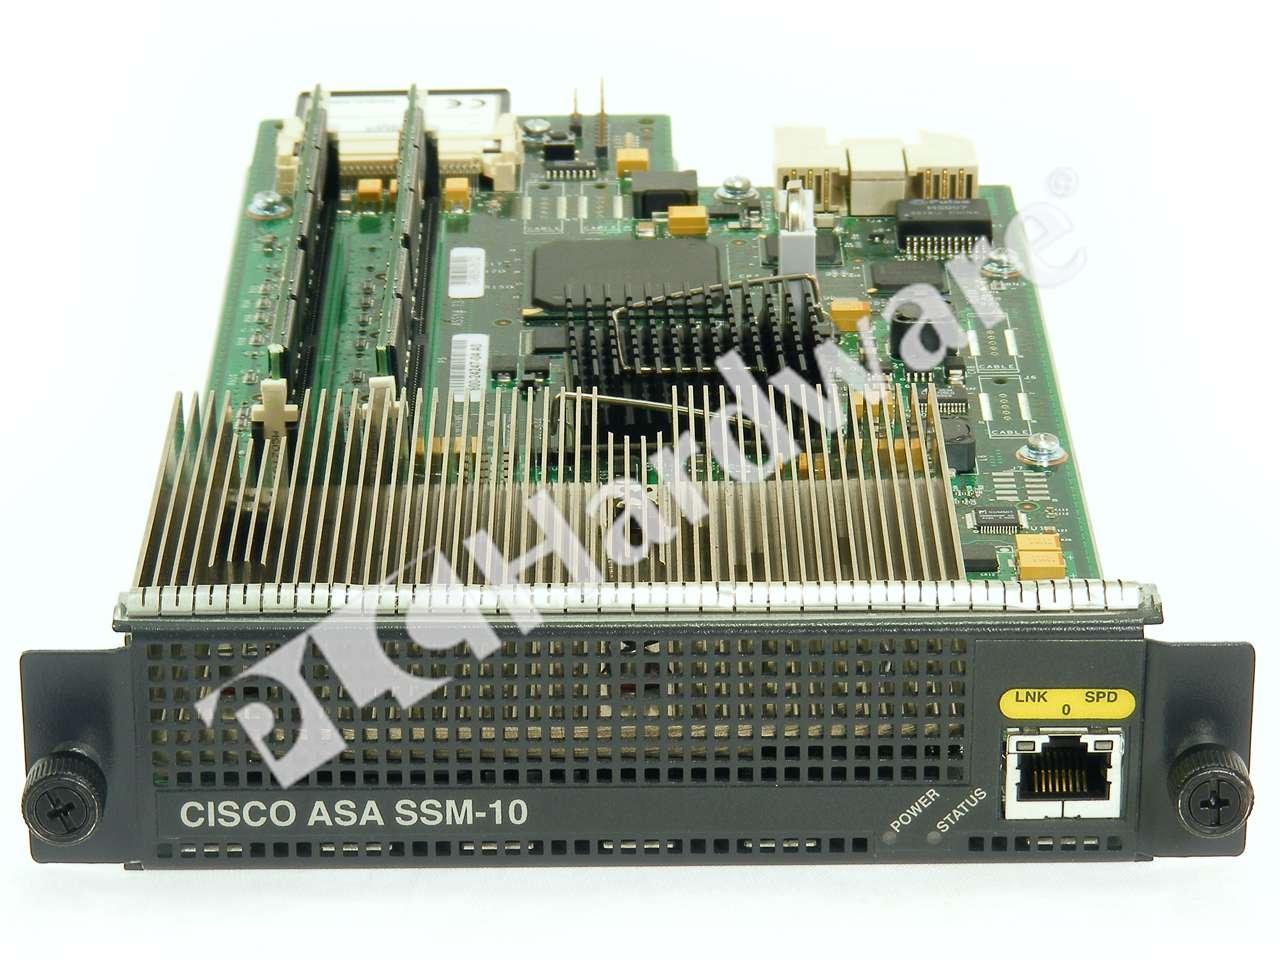 SSM: Cisco ASA-SSM-AIP-10-K9=, Used In A PLCH